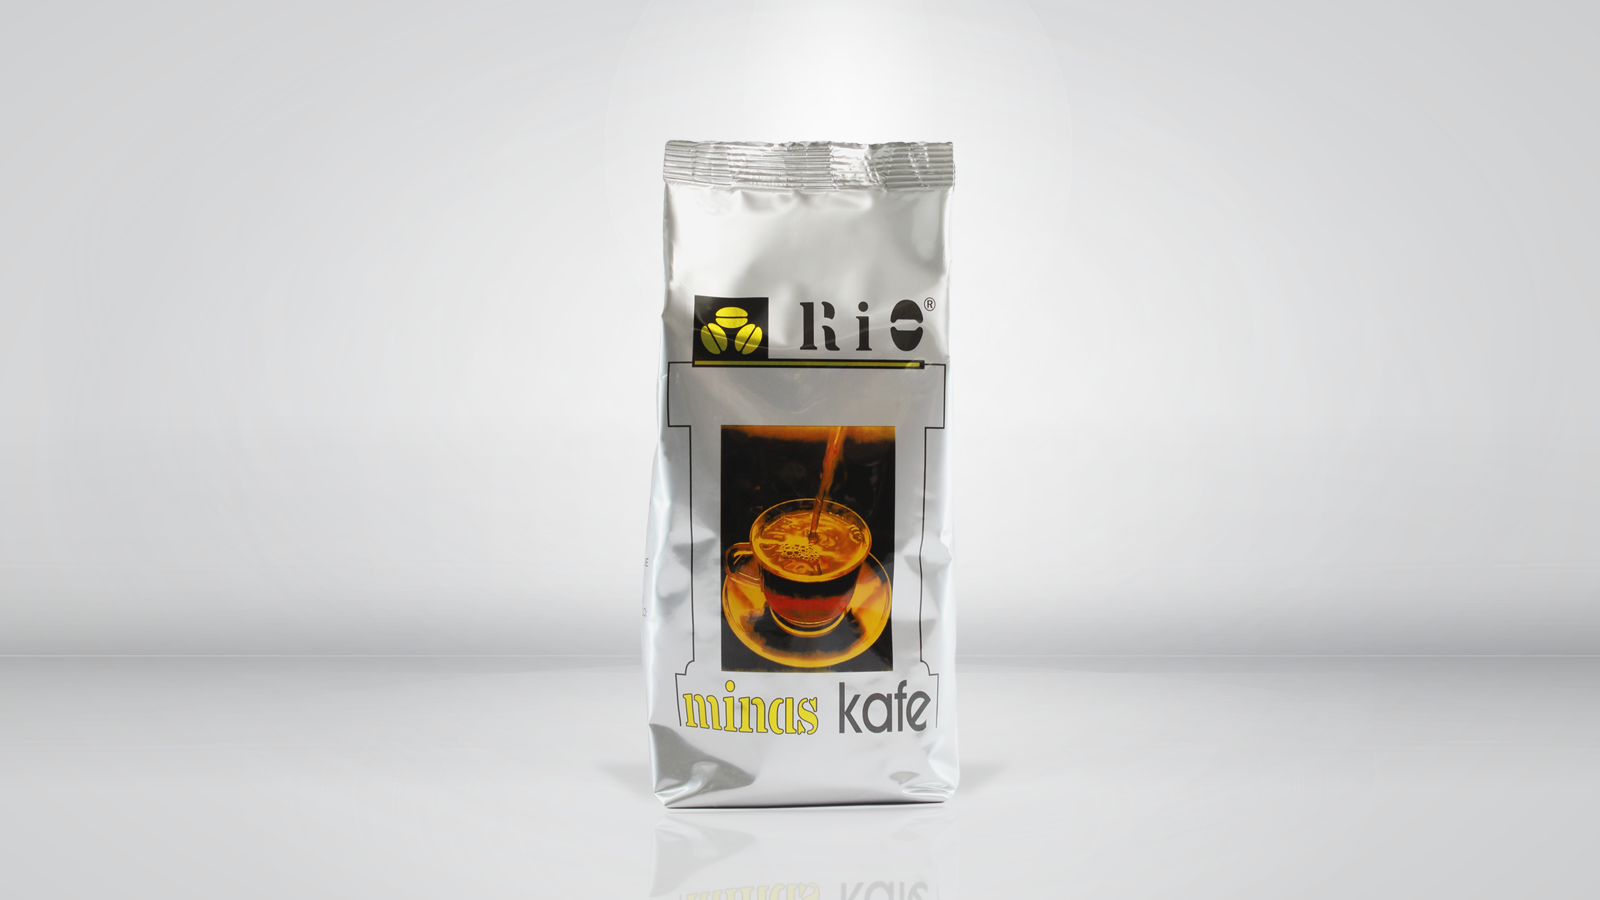 rio-minas_kafe_3